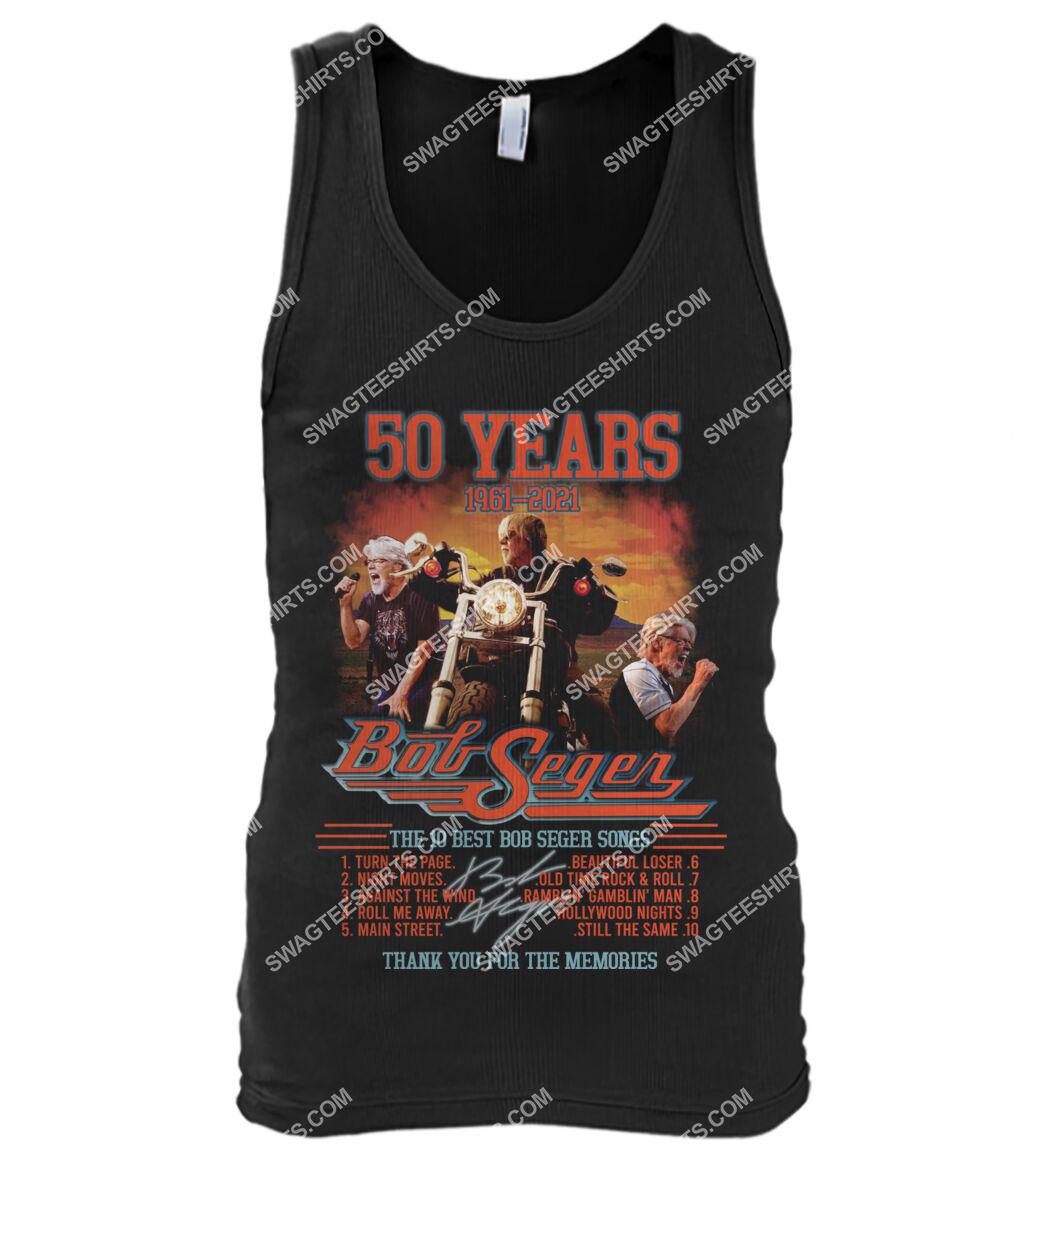 bob saget 50 years thank you for memories signature tank top 1